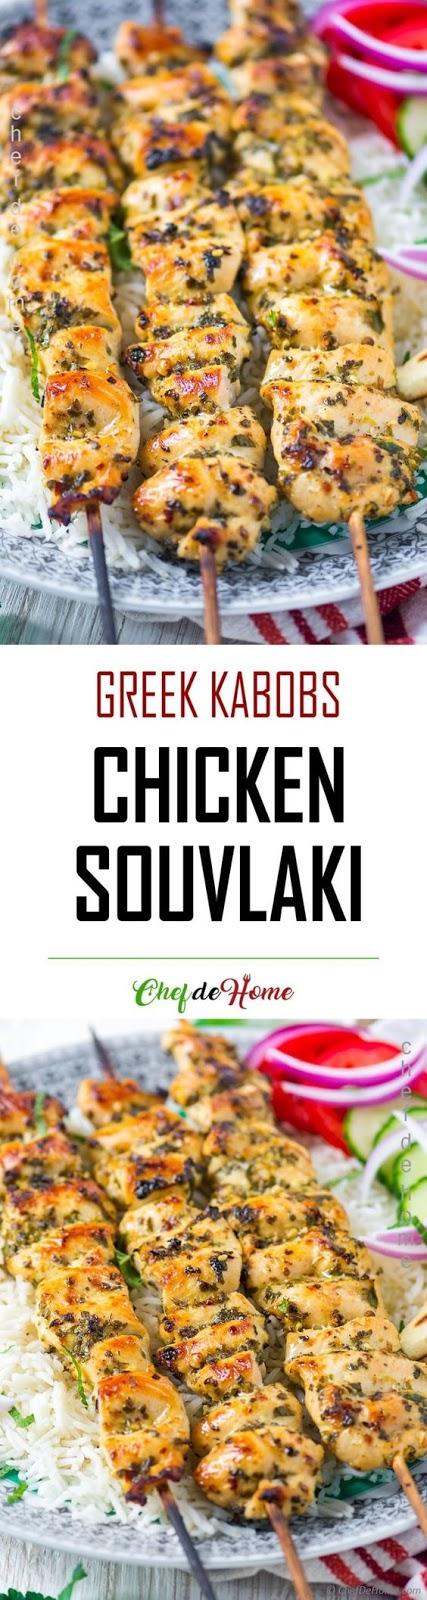 Chicken Souvlaki recipe (Skewers) with Pita Bread